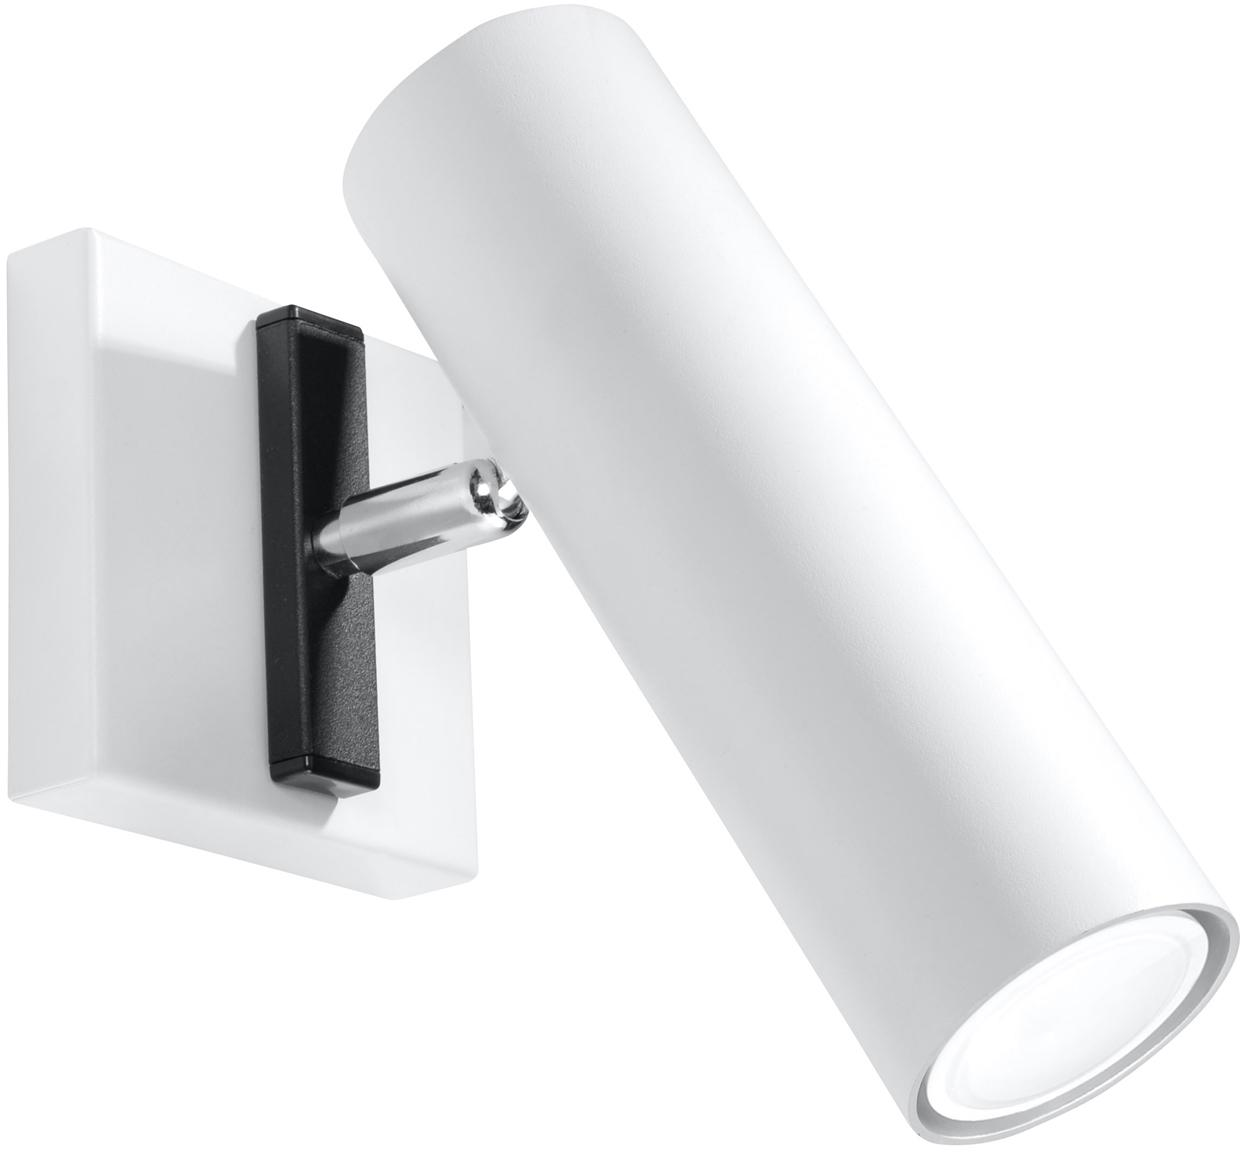 Wandleuchte Mira, Lampenschirm: Stahl, Weiß, 18 x 18 cm